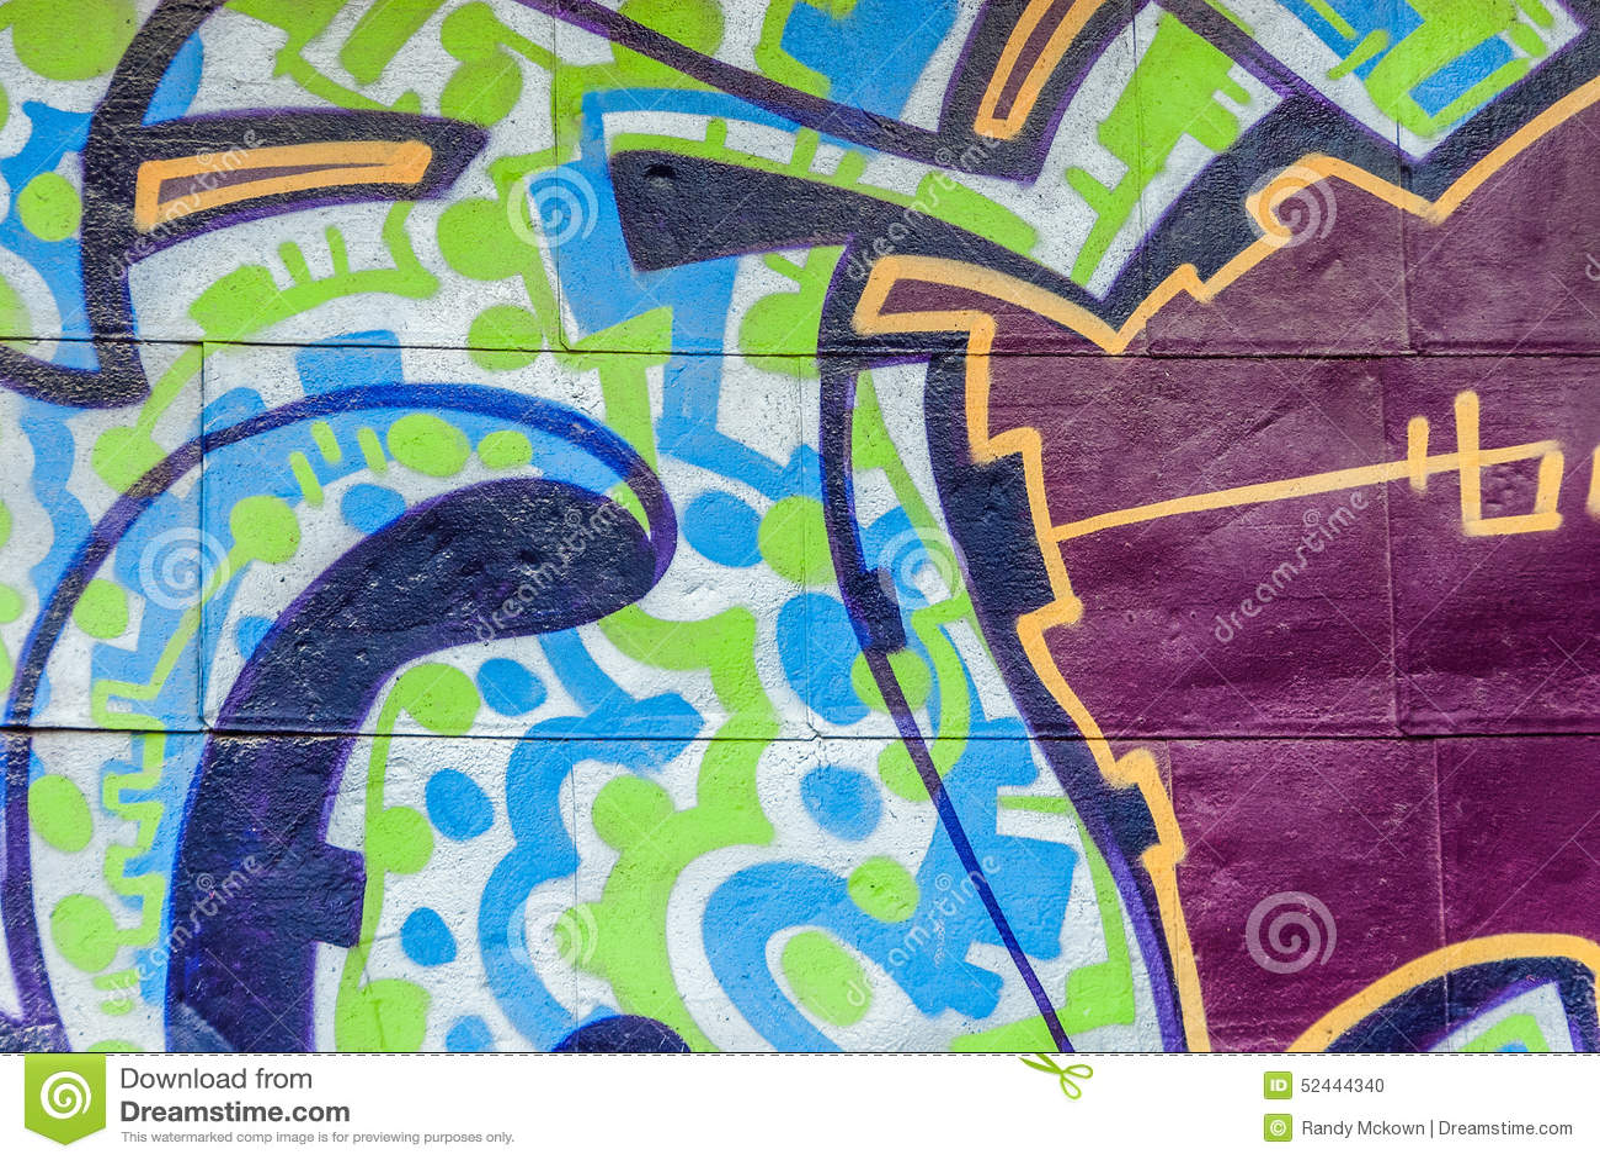 Graffiti ściana